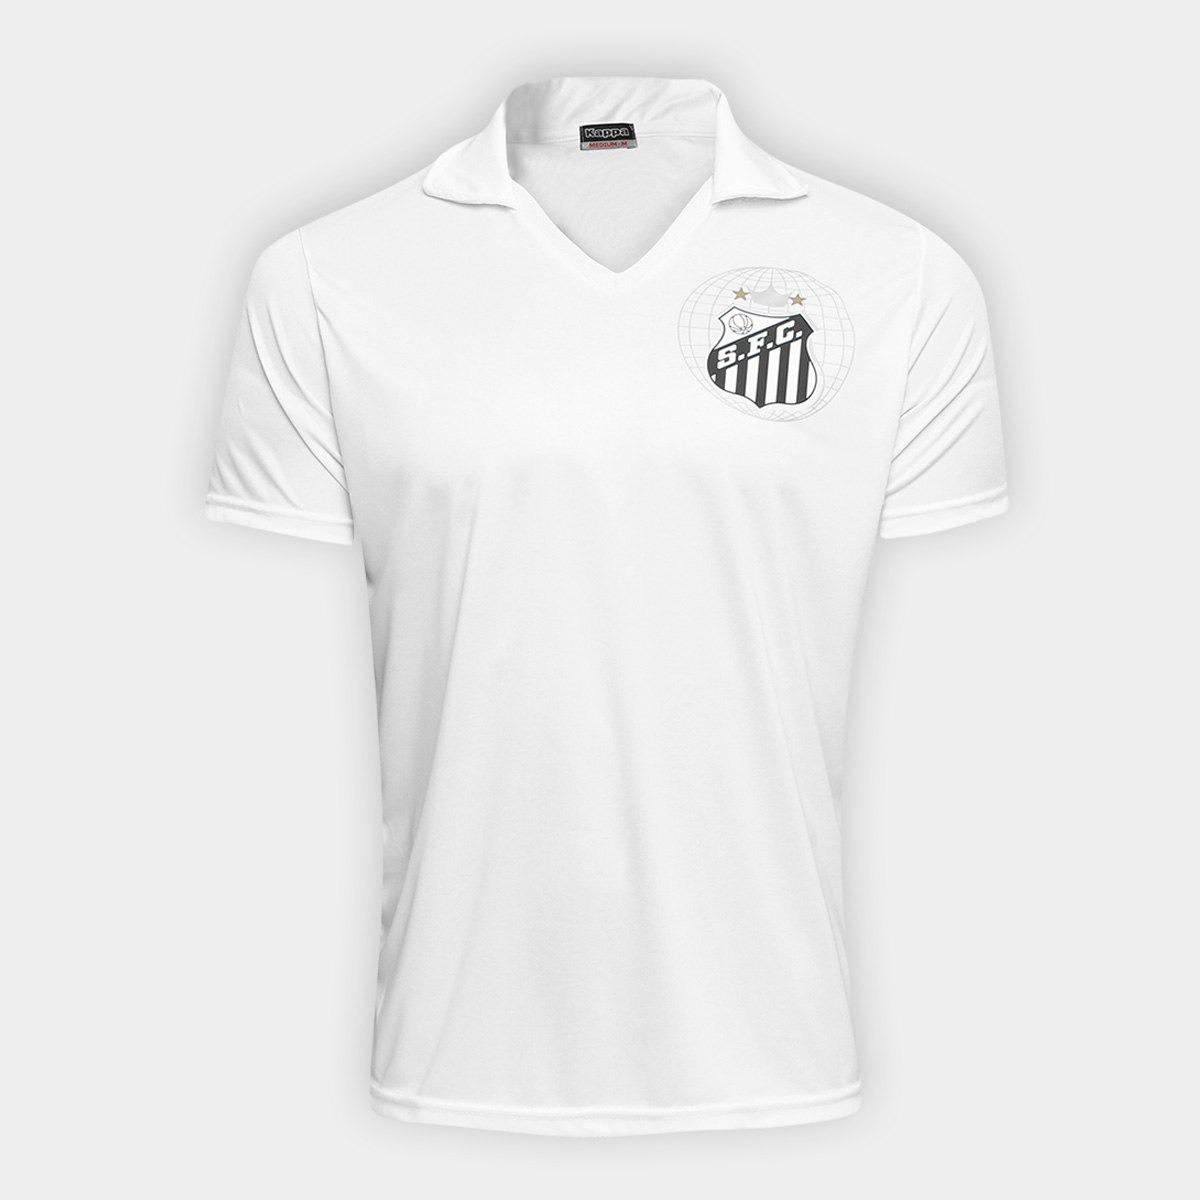 ca3dfb0771 Camisa Santos Kappa Branca Futebol Campeao Vila Santista - R  120